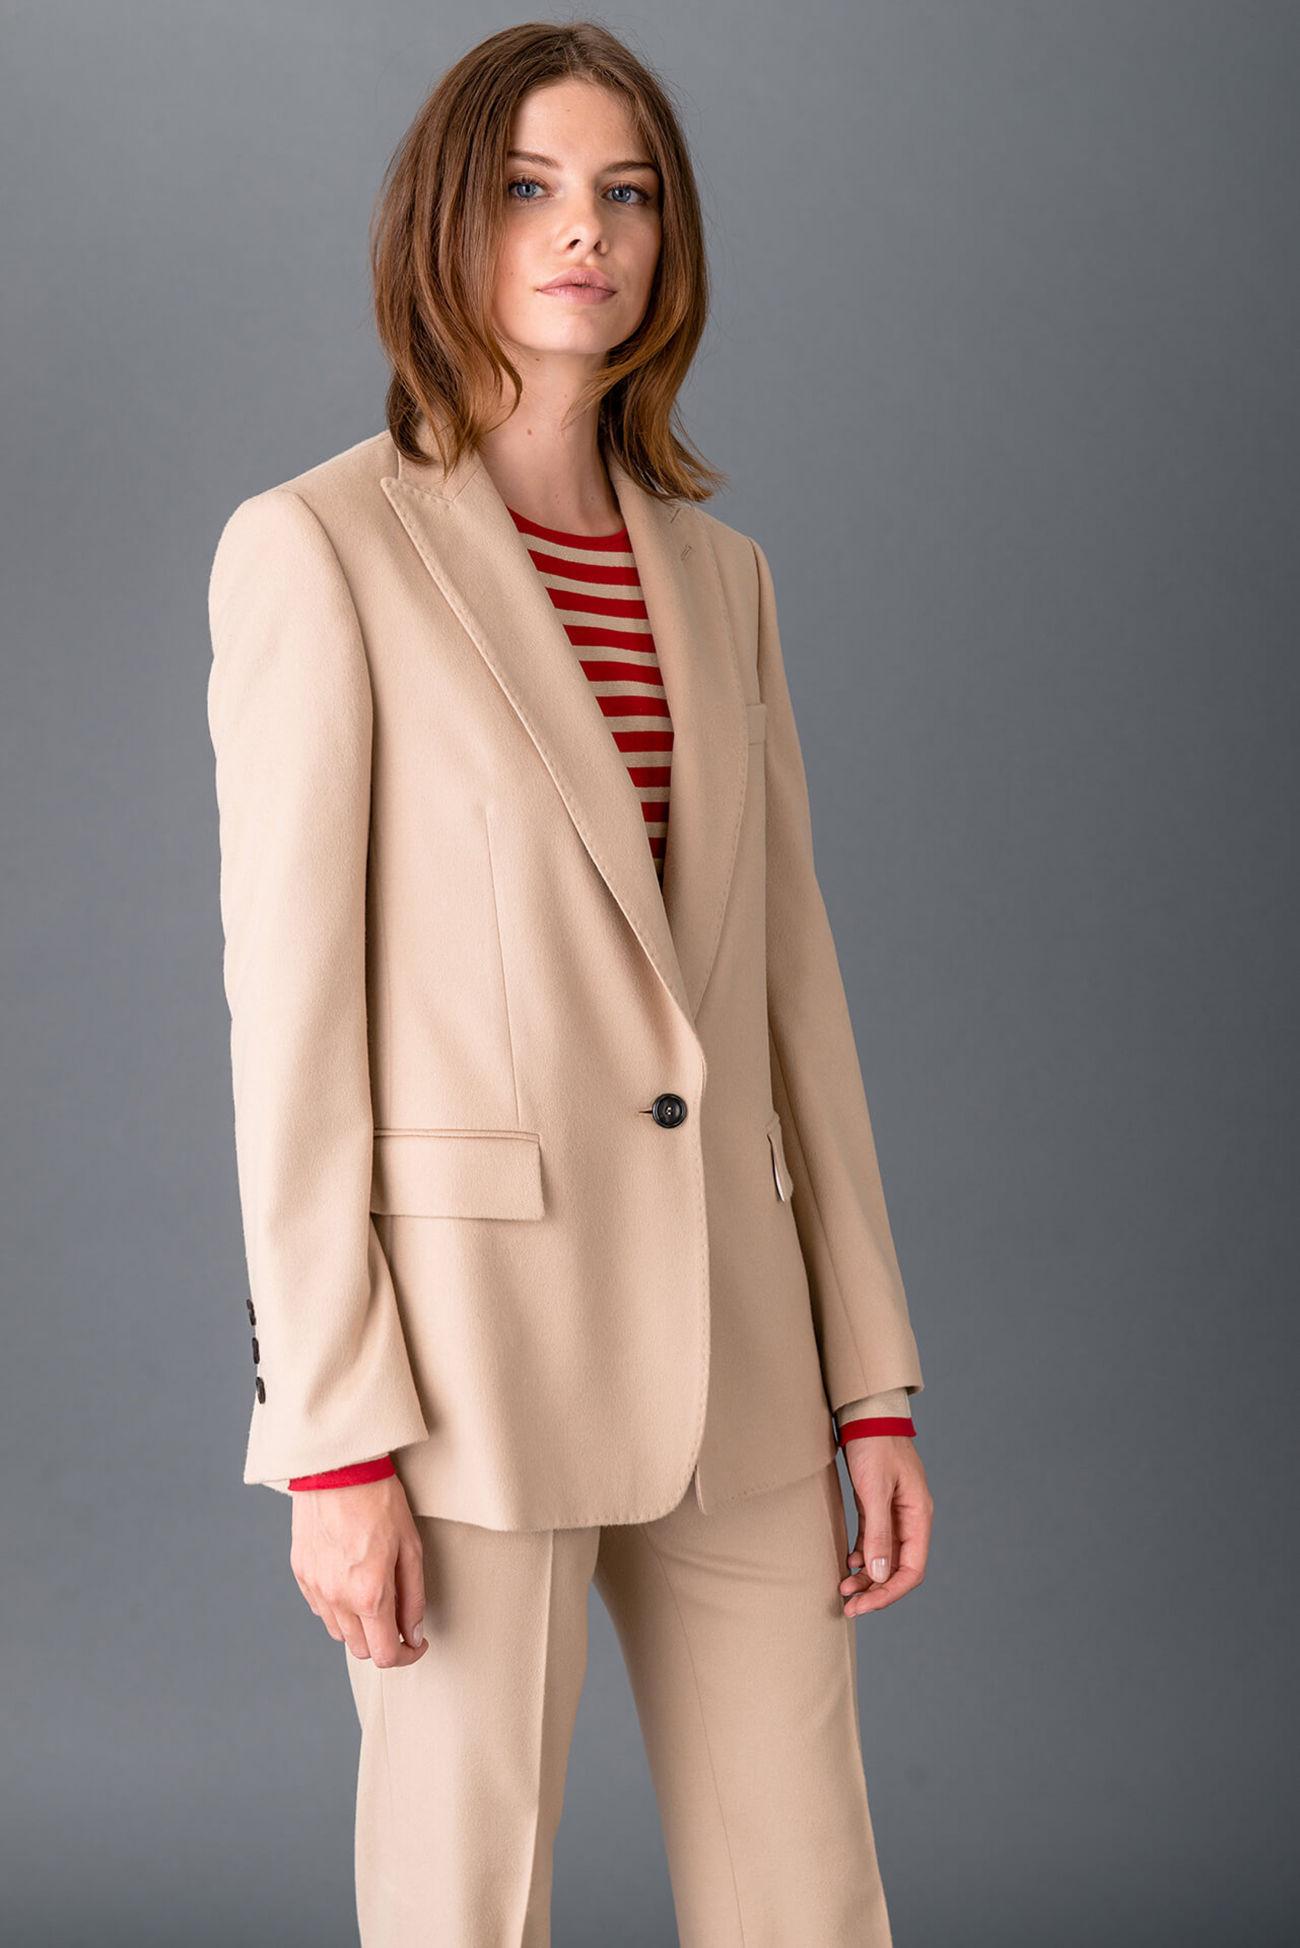 Elegant blazer made of new wool cashmere blend